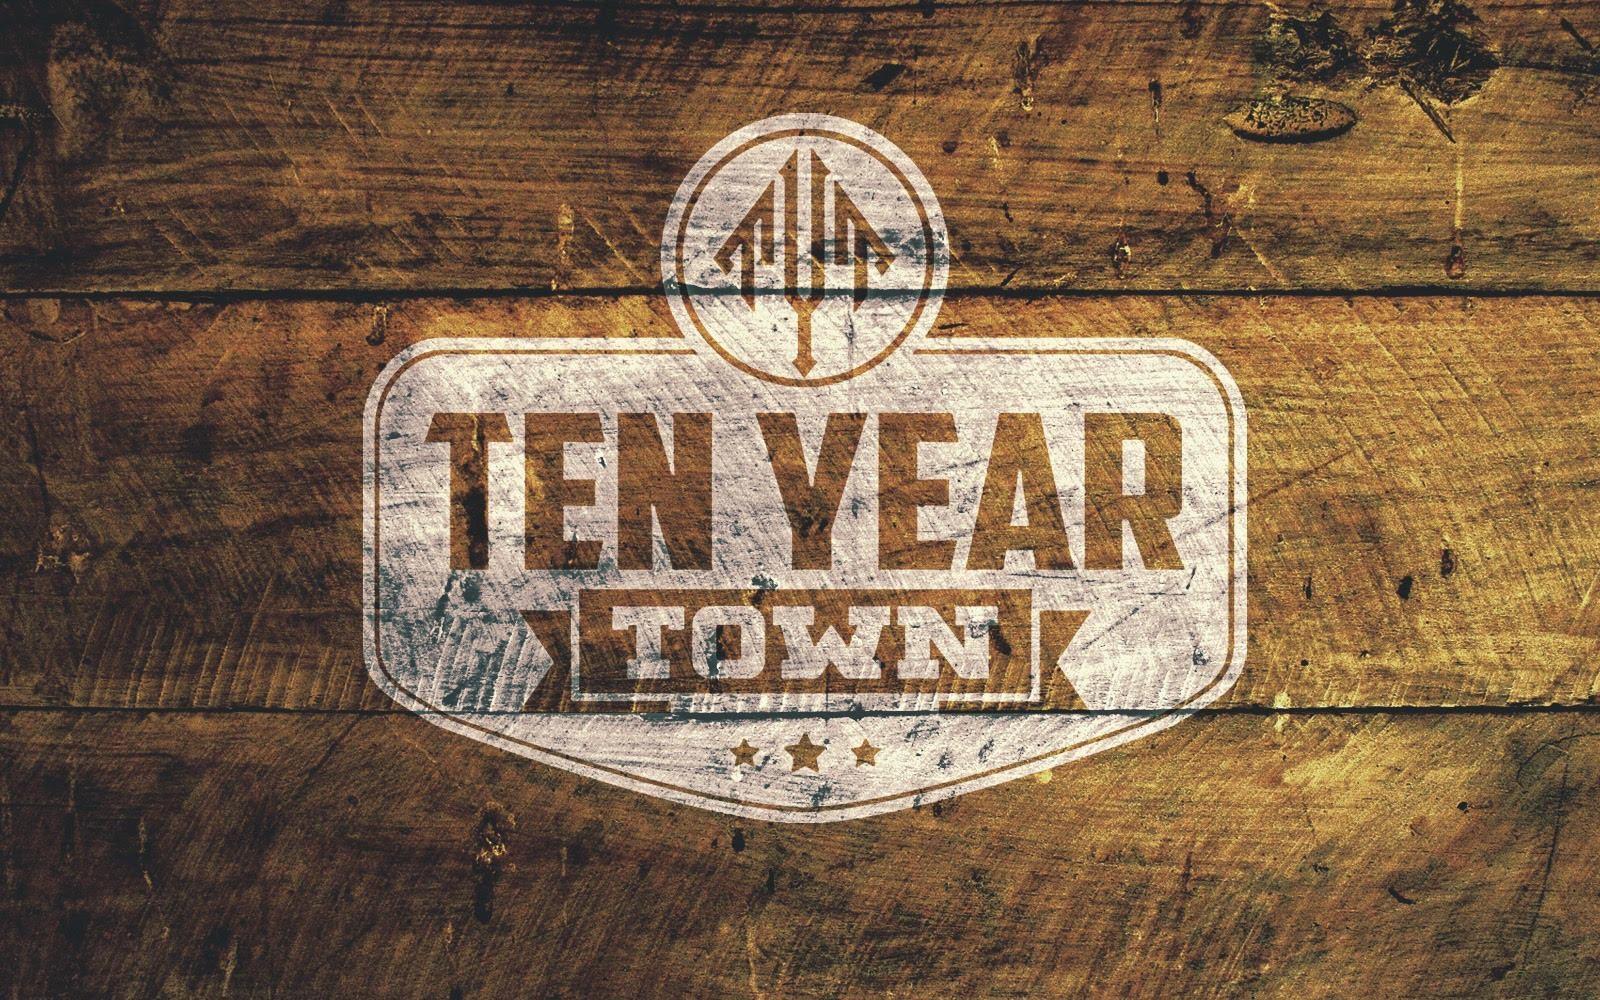 Ten Year Town at Scoreboard